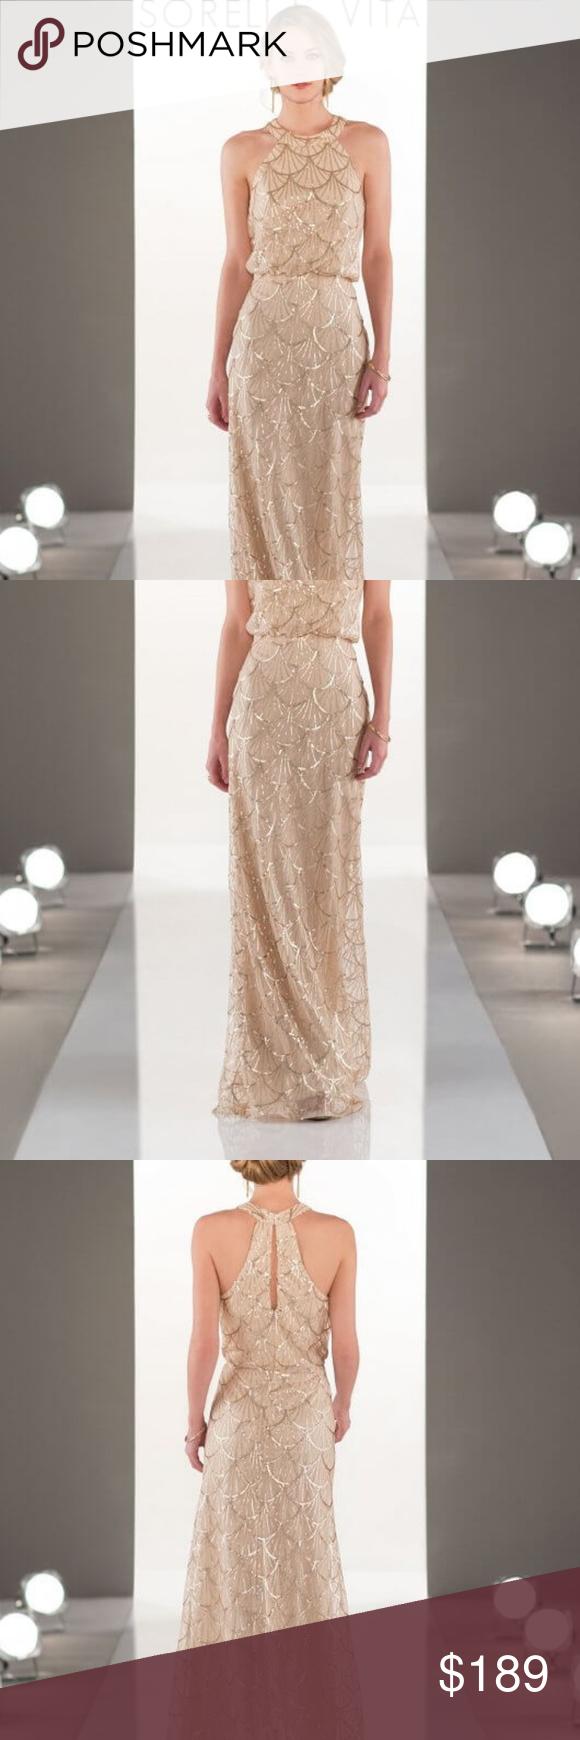 8852c869 Sorella Vita Nouveau Sequin Bridesmaid Dresses